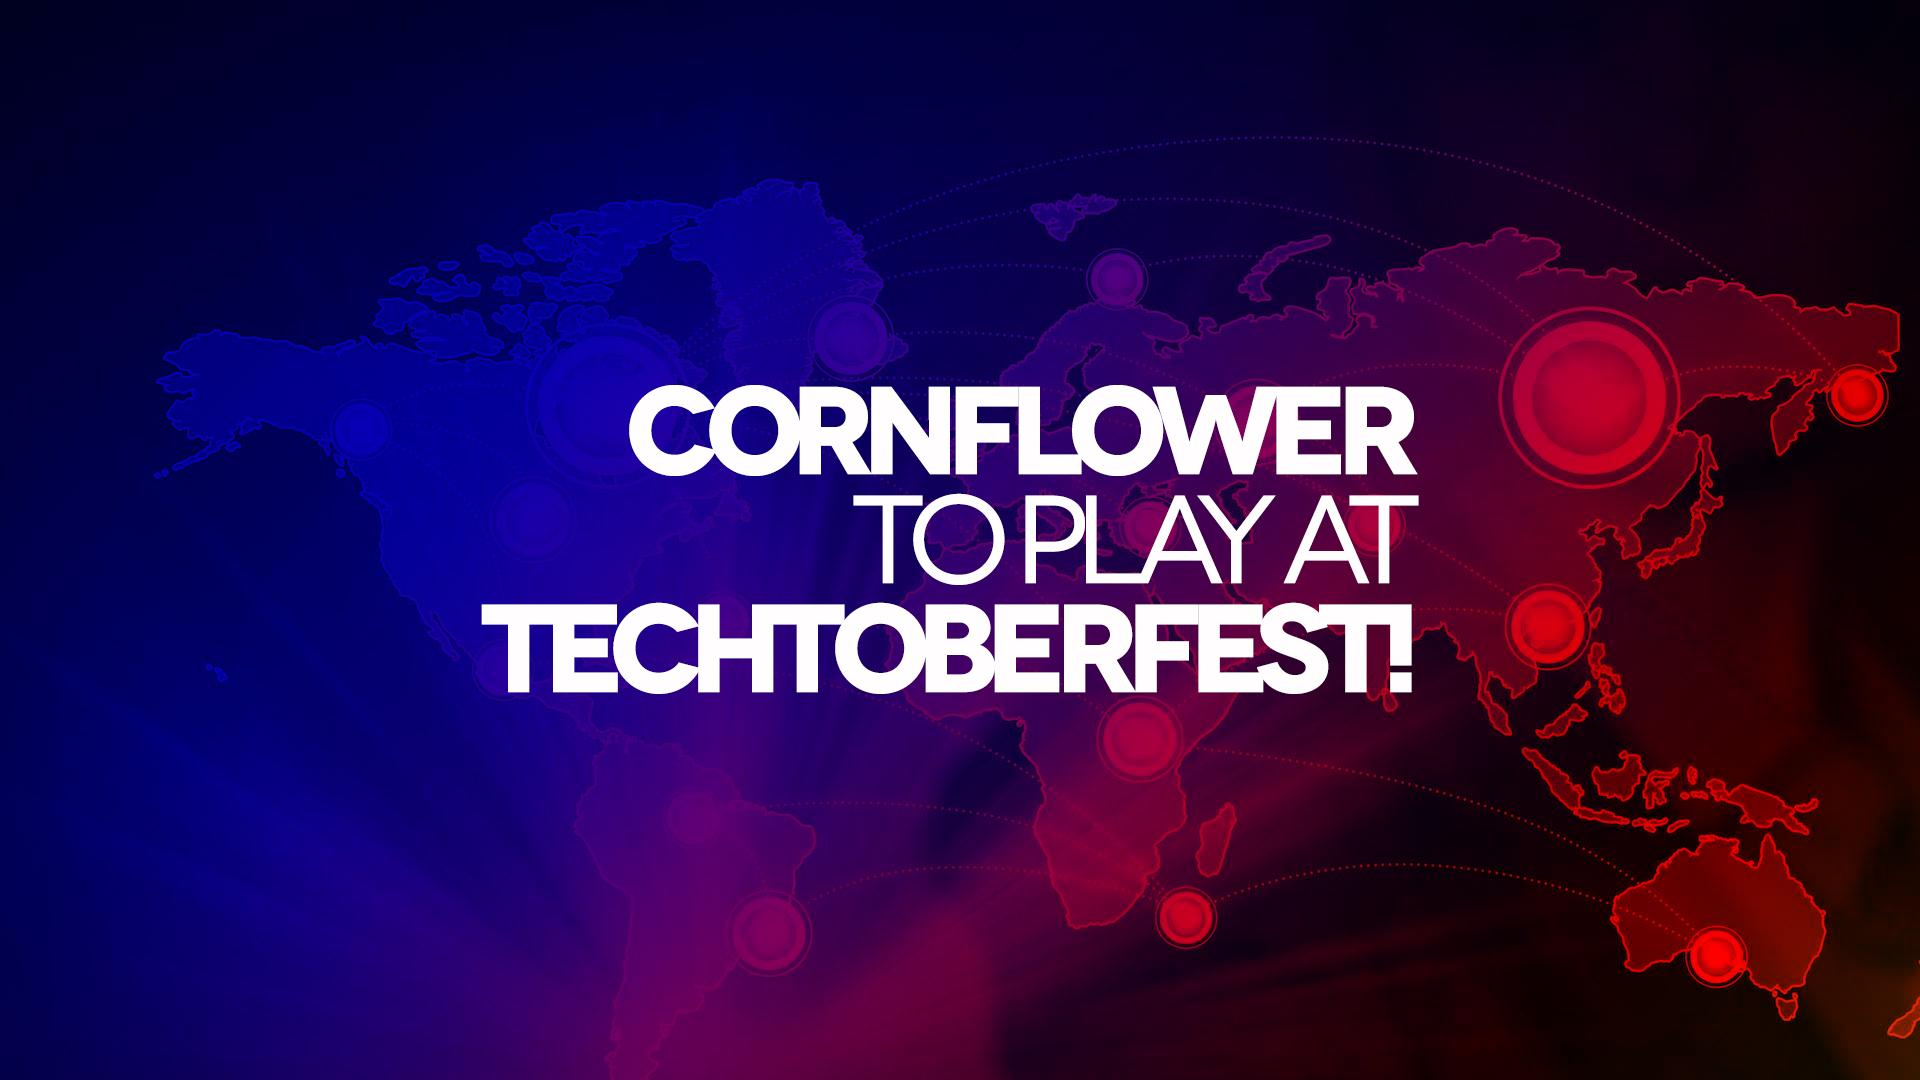 20150903-Techtoberfest.jpg